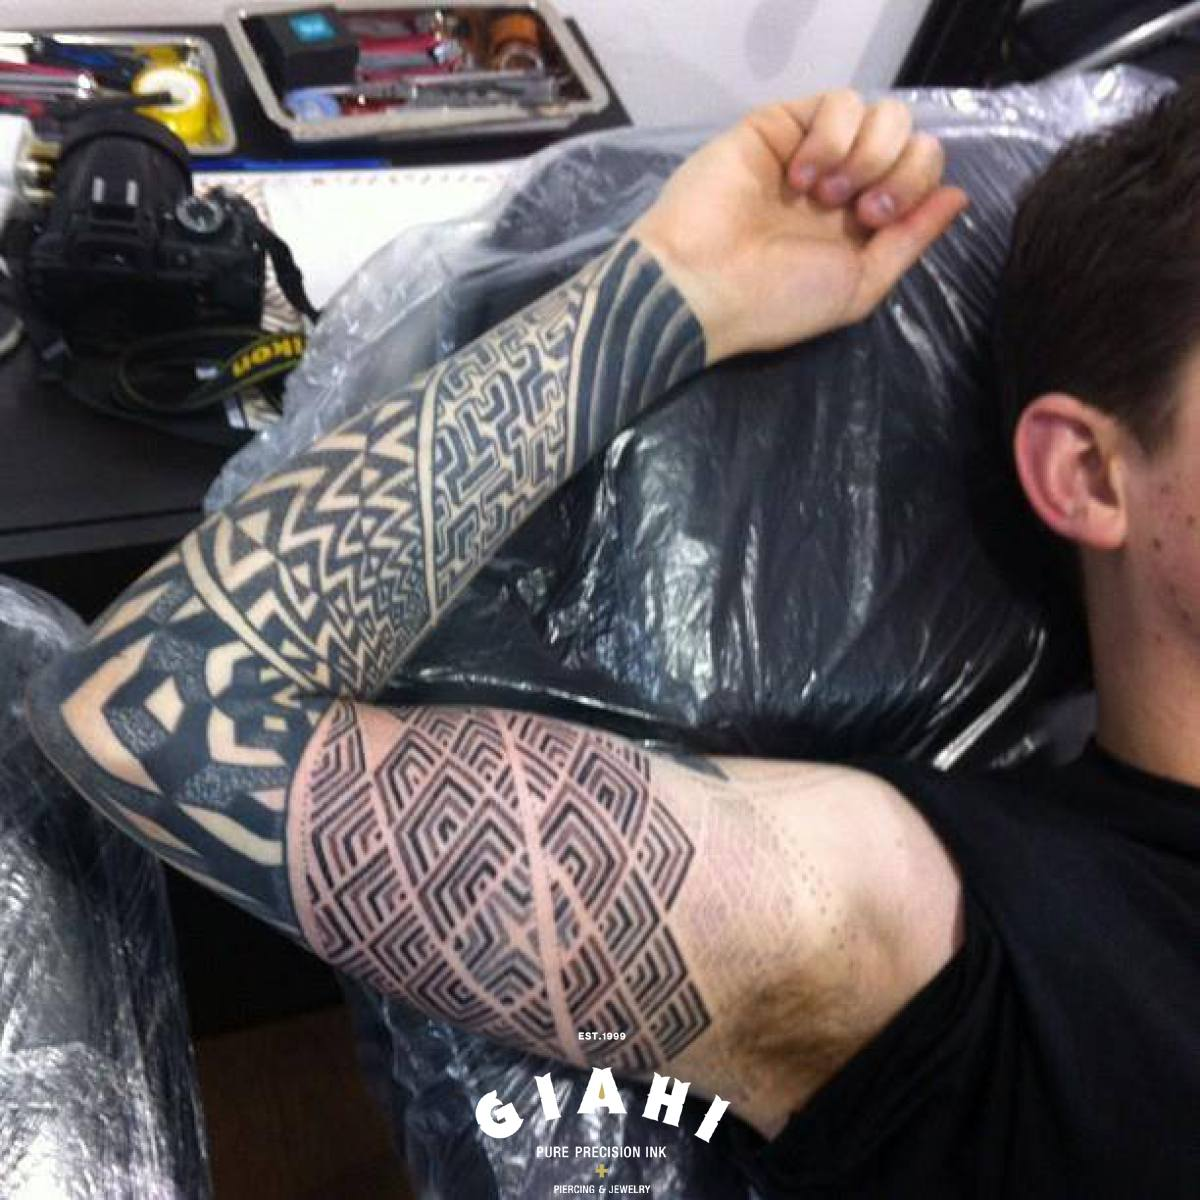 Labyrinth Dotwork tattoo sleeve by Andy Cryztalz